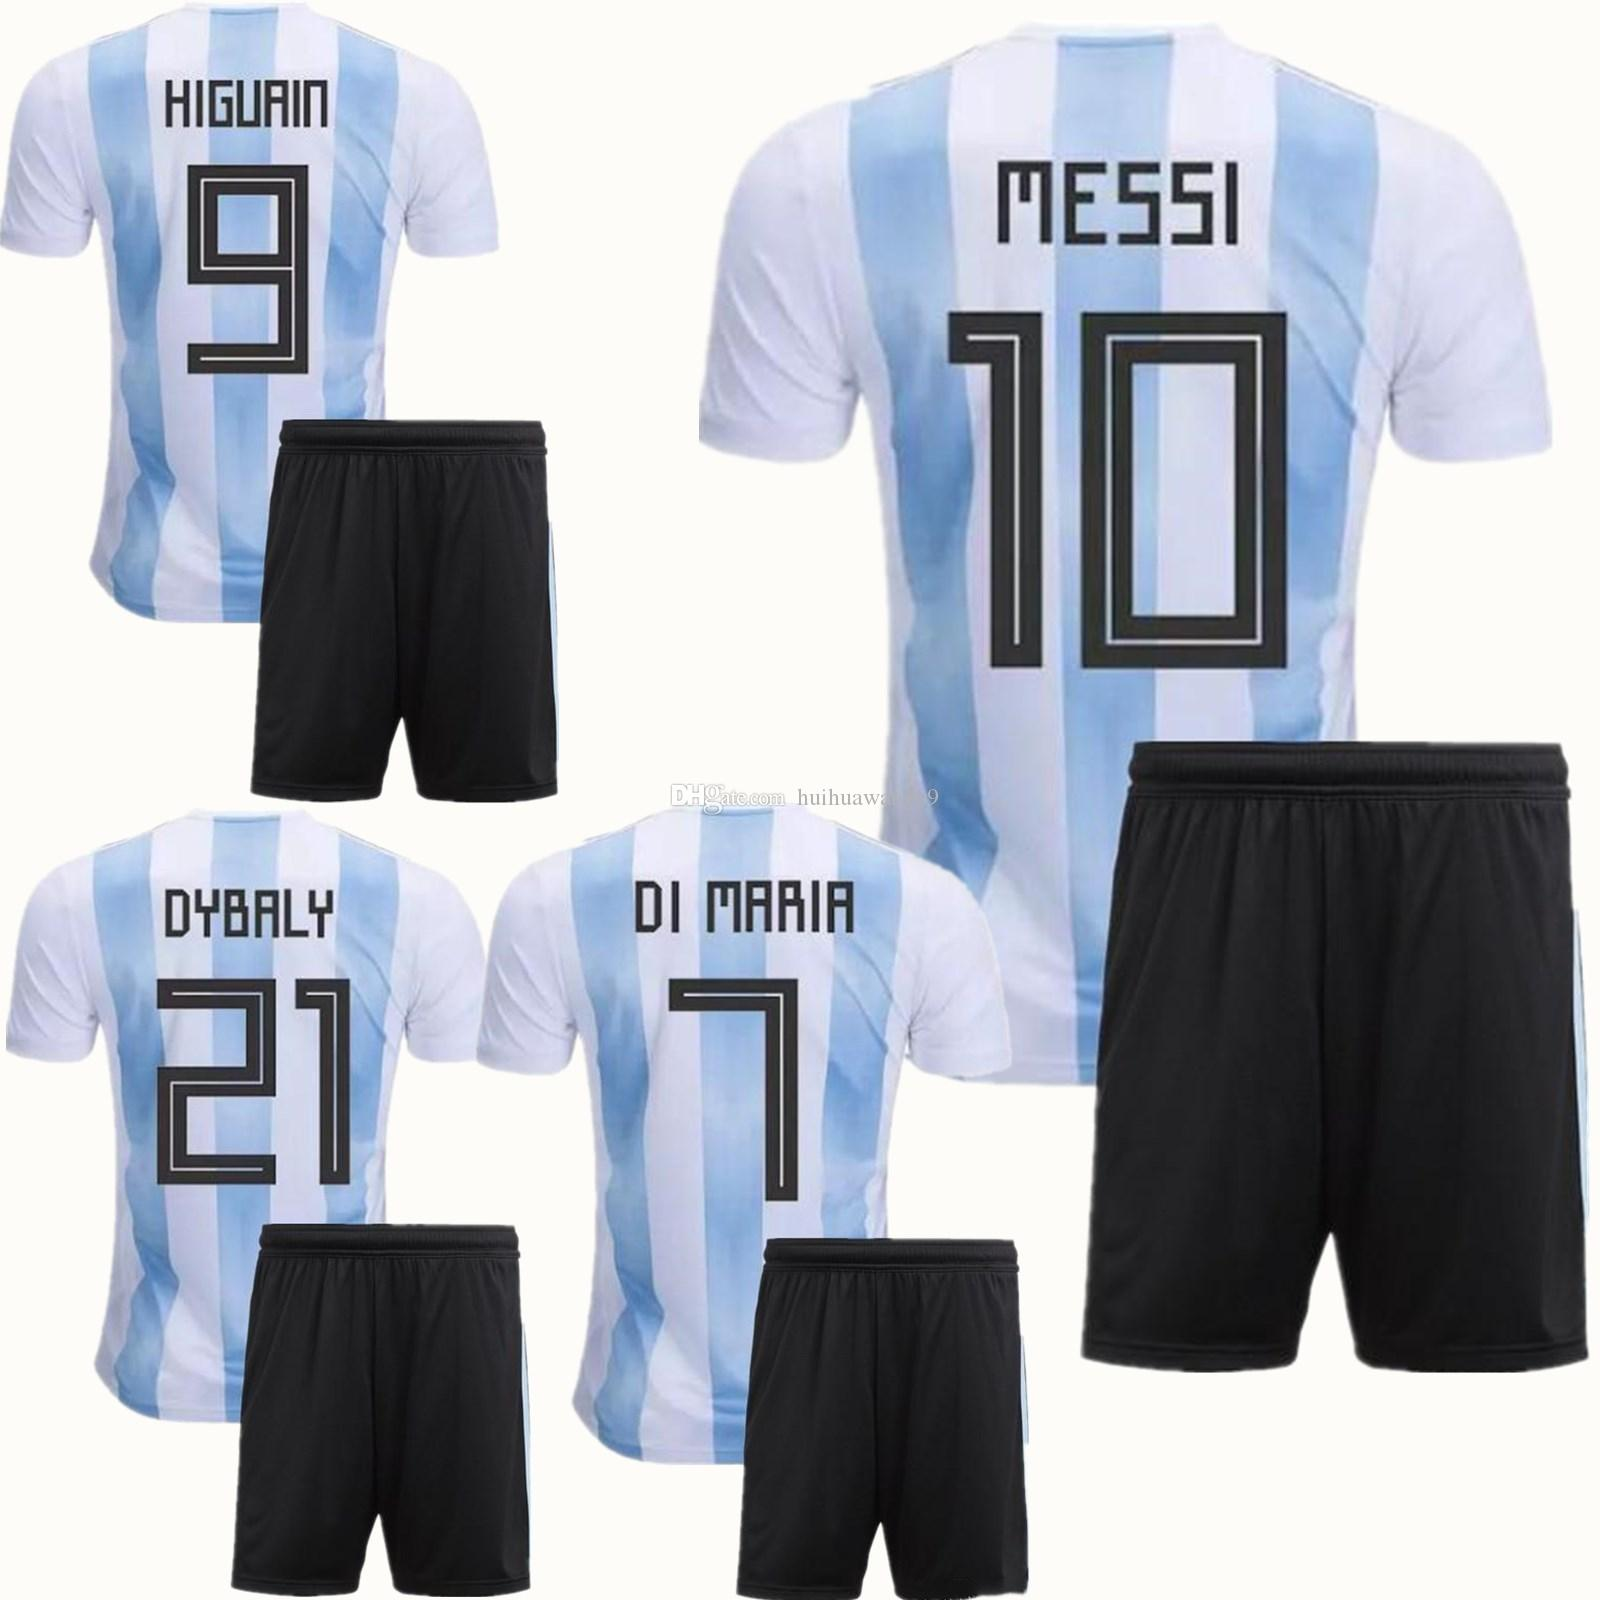 Compre 2018 Conjuntos De Futebol Da Copa Do Mundo Argentina 10 MESSI DI  MARIA AGUERO KOMPANY DYBALA Jersey Casa Azul Kit Adultos Uniforme Argentina  Futebol ... d4eefc1a9ed0b